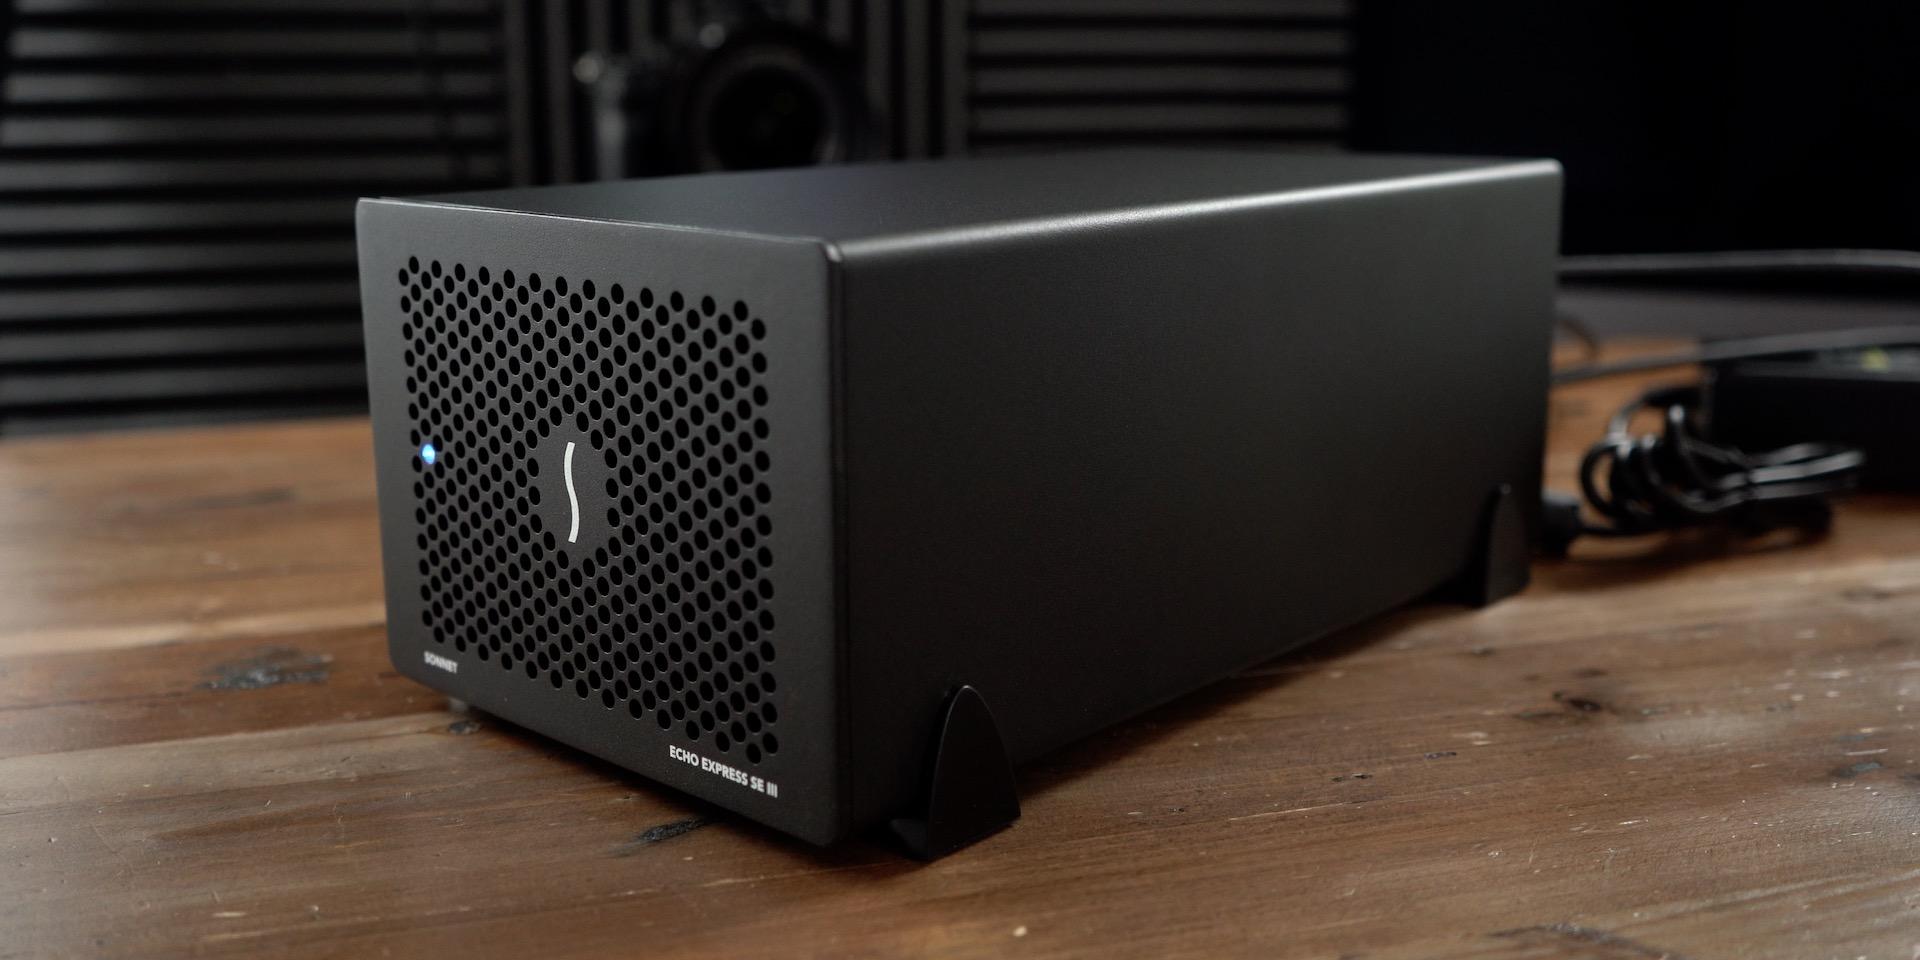 Sonnet Echo Express SEIII 4K video capture enclosure with Blackmagic Decklink Mini Recorder 4K